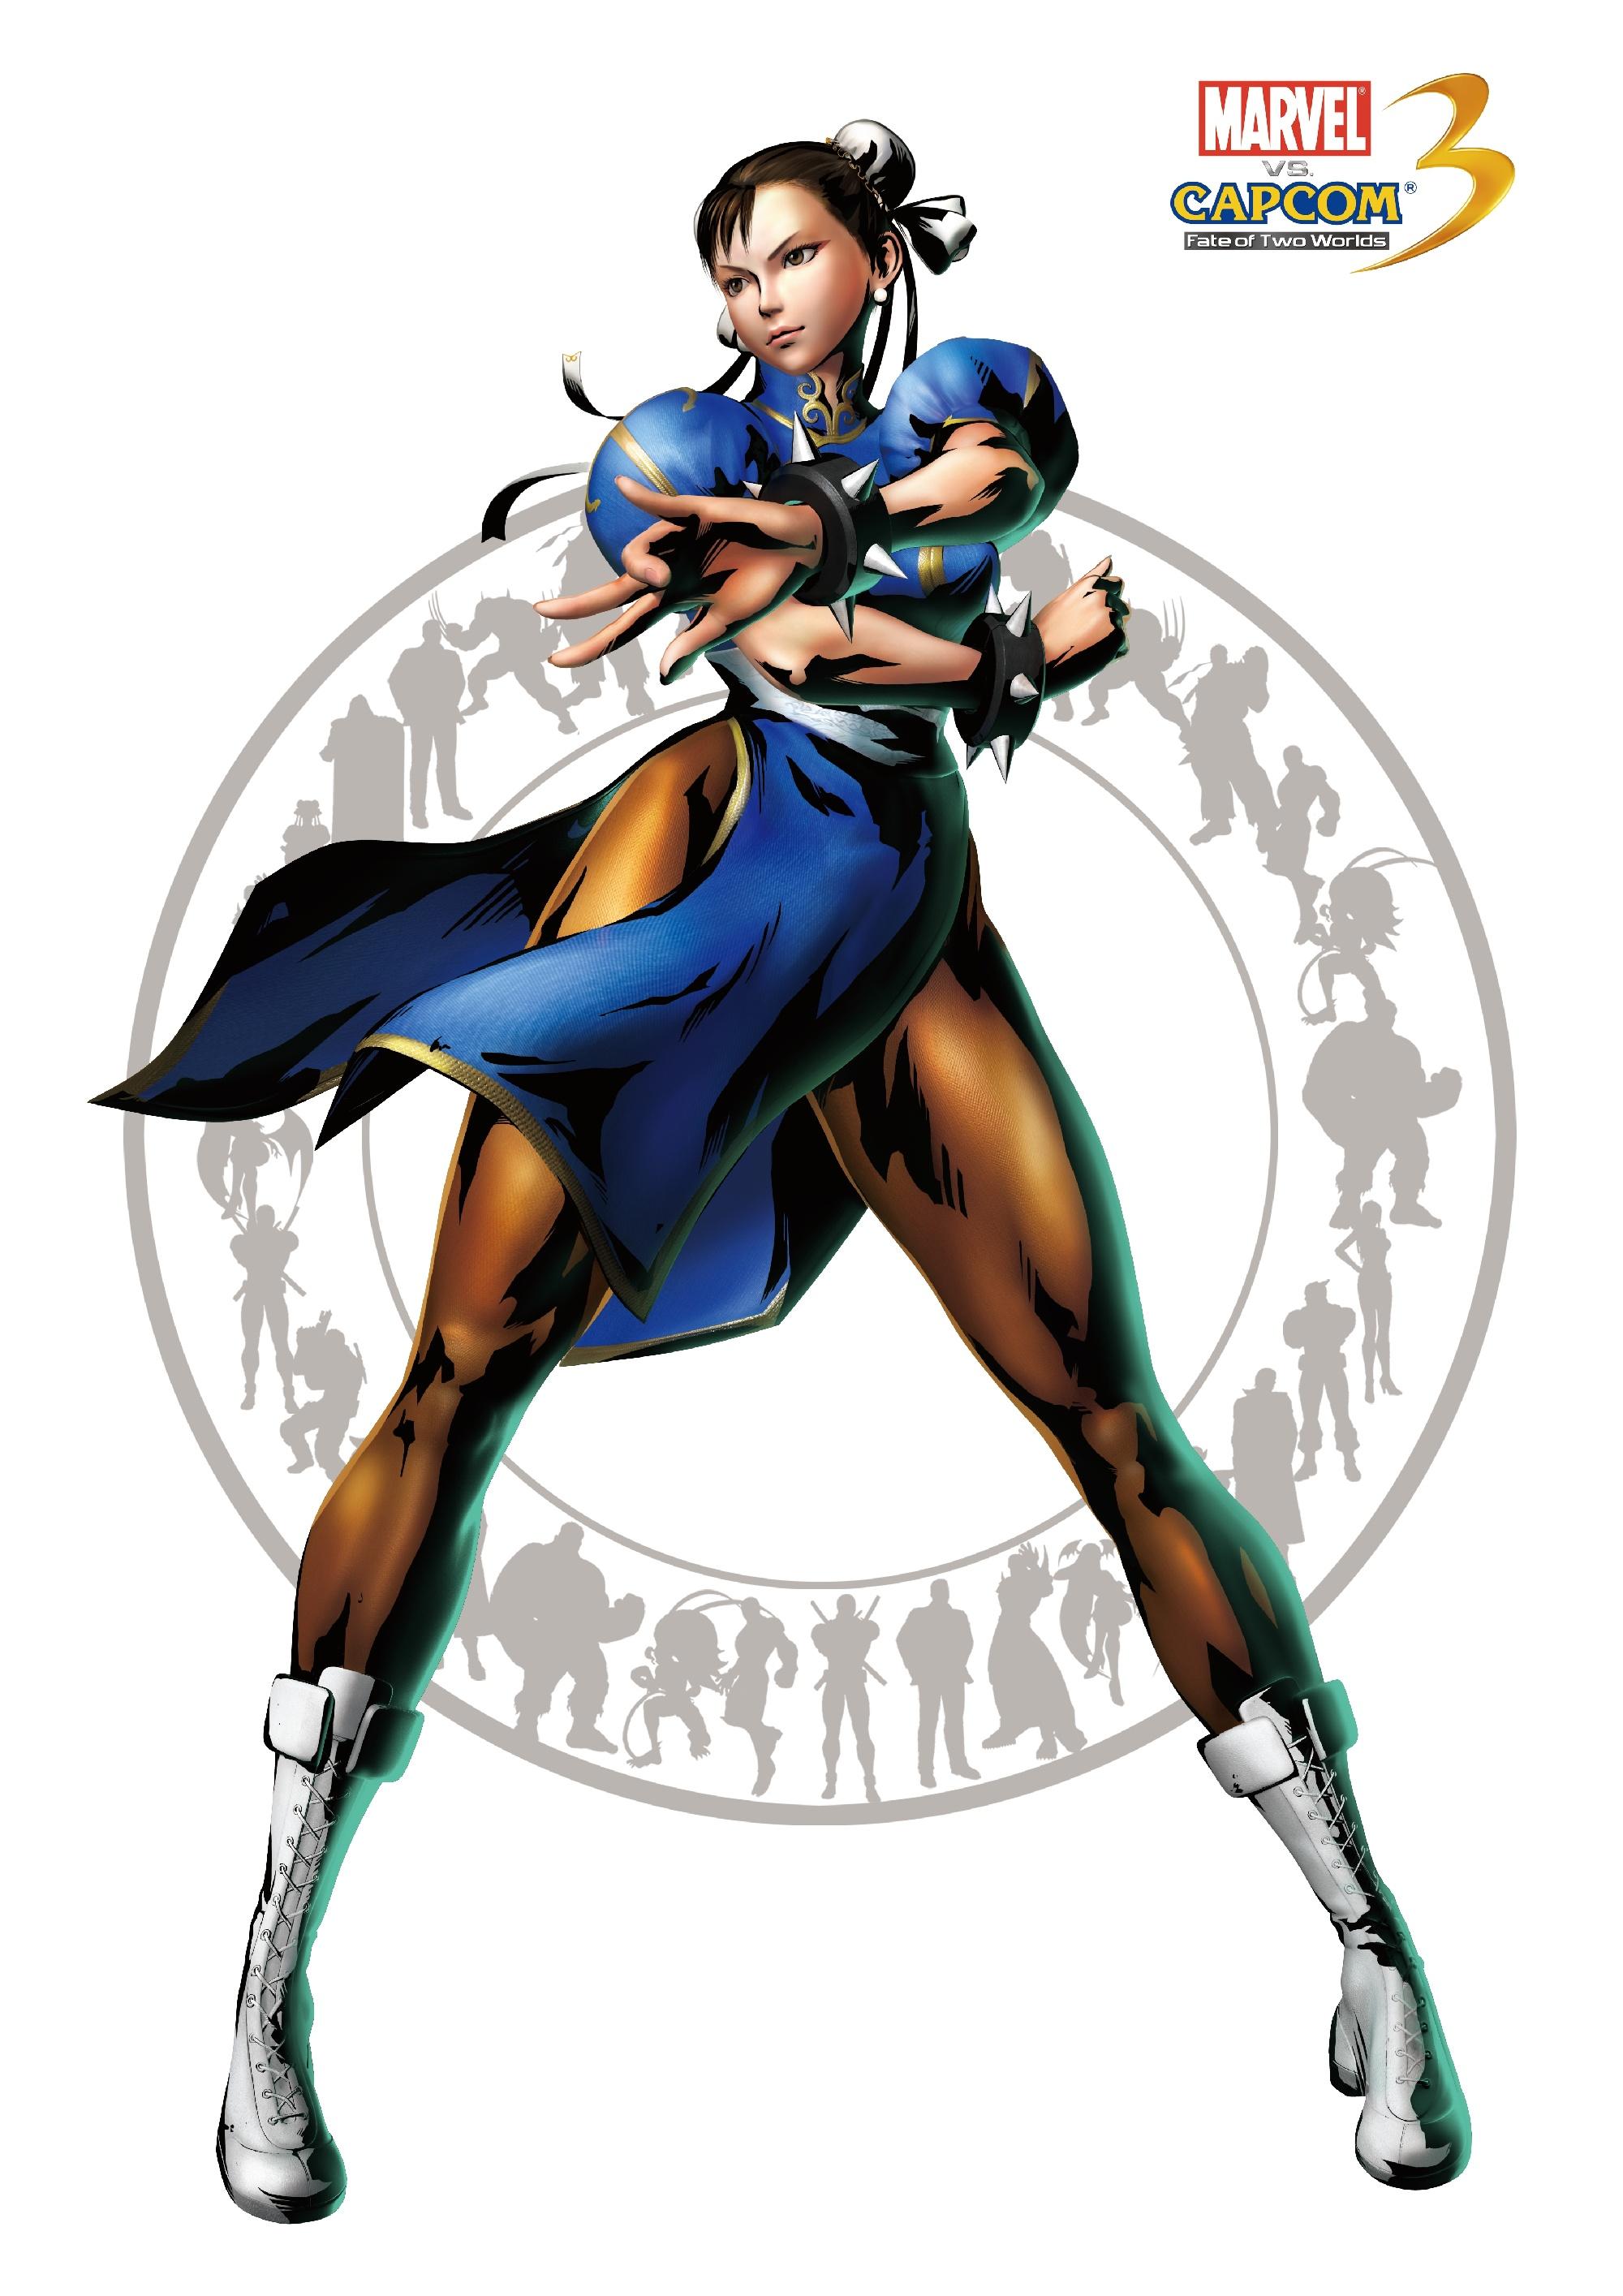 Чунь Ли - Marvel vs. Capcom 3: Fate of Two Worlds Арт, Персонаж